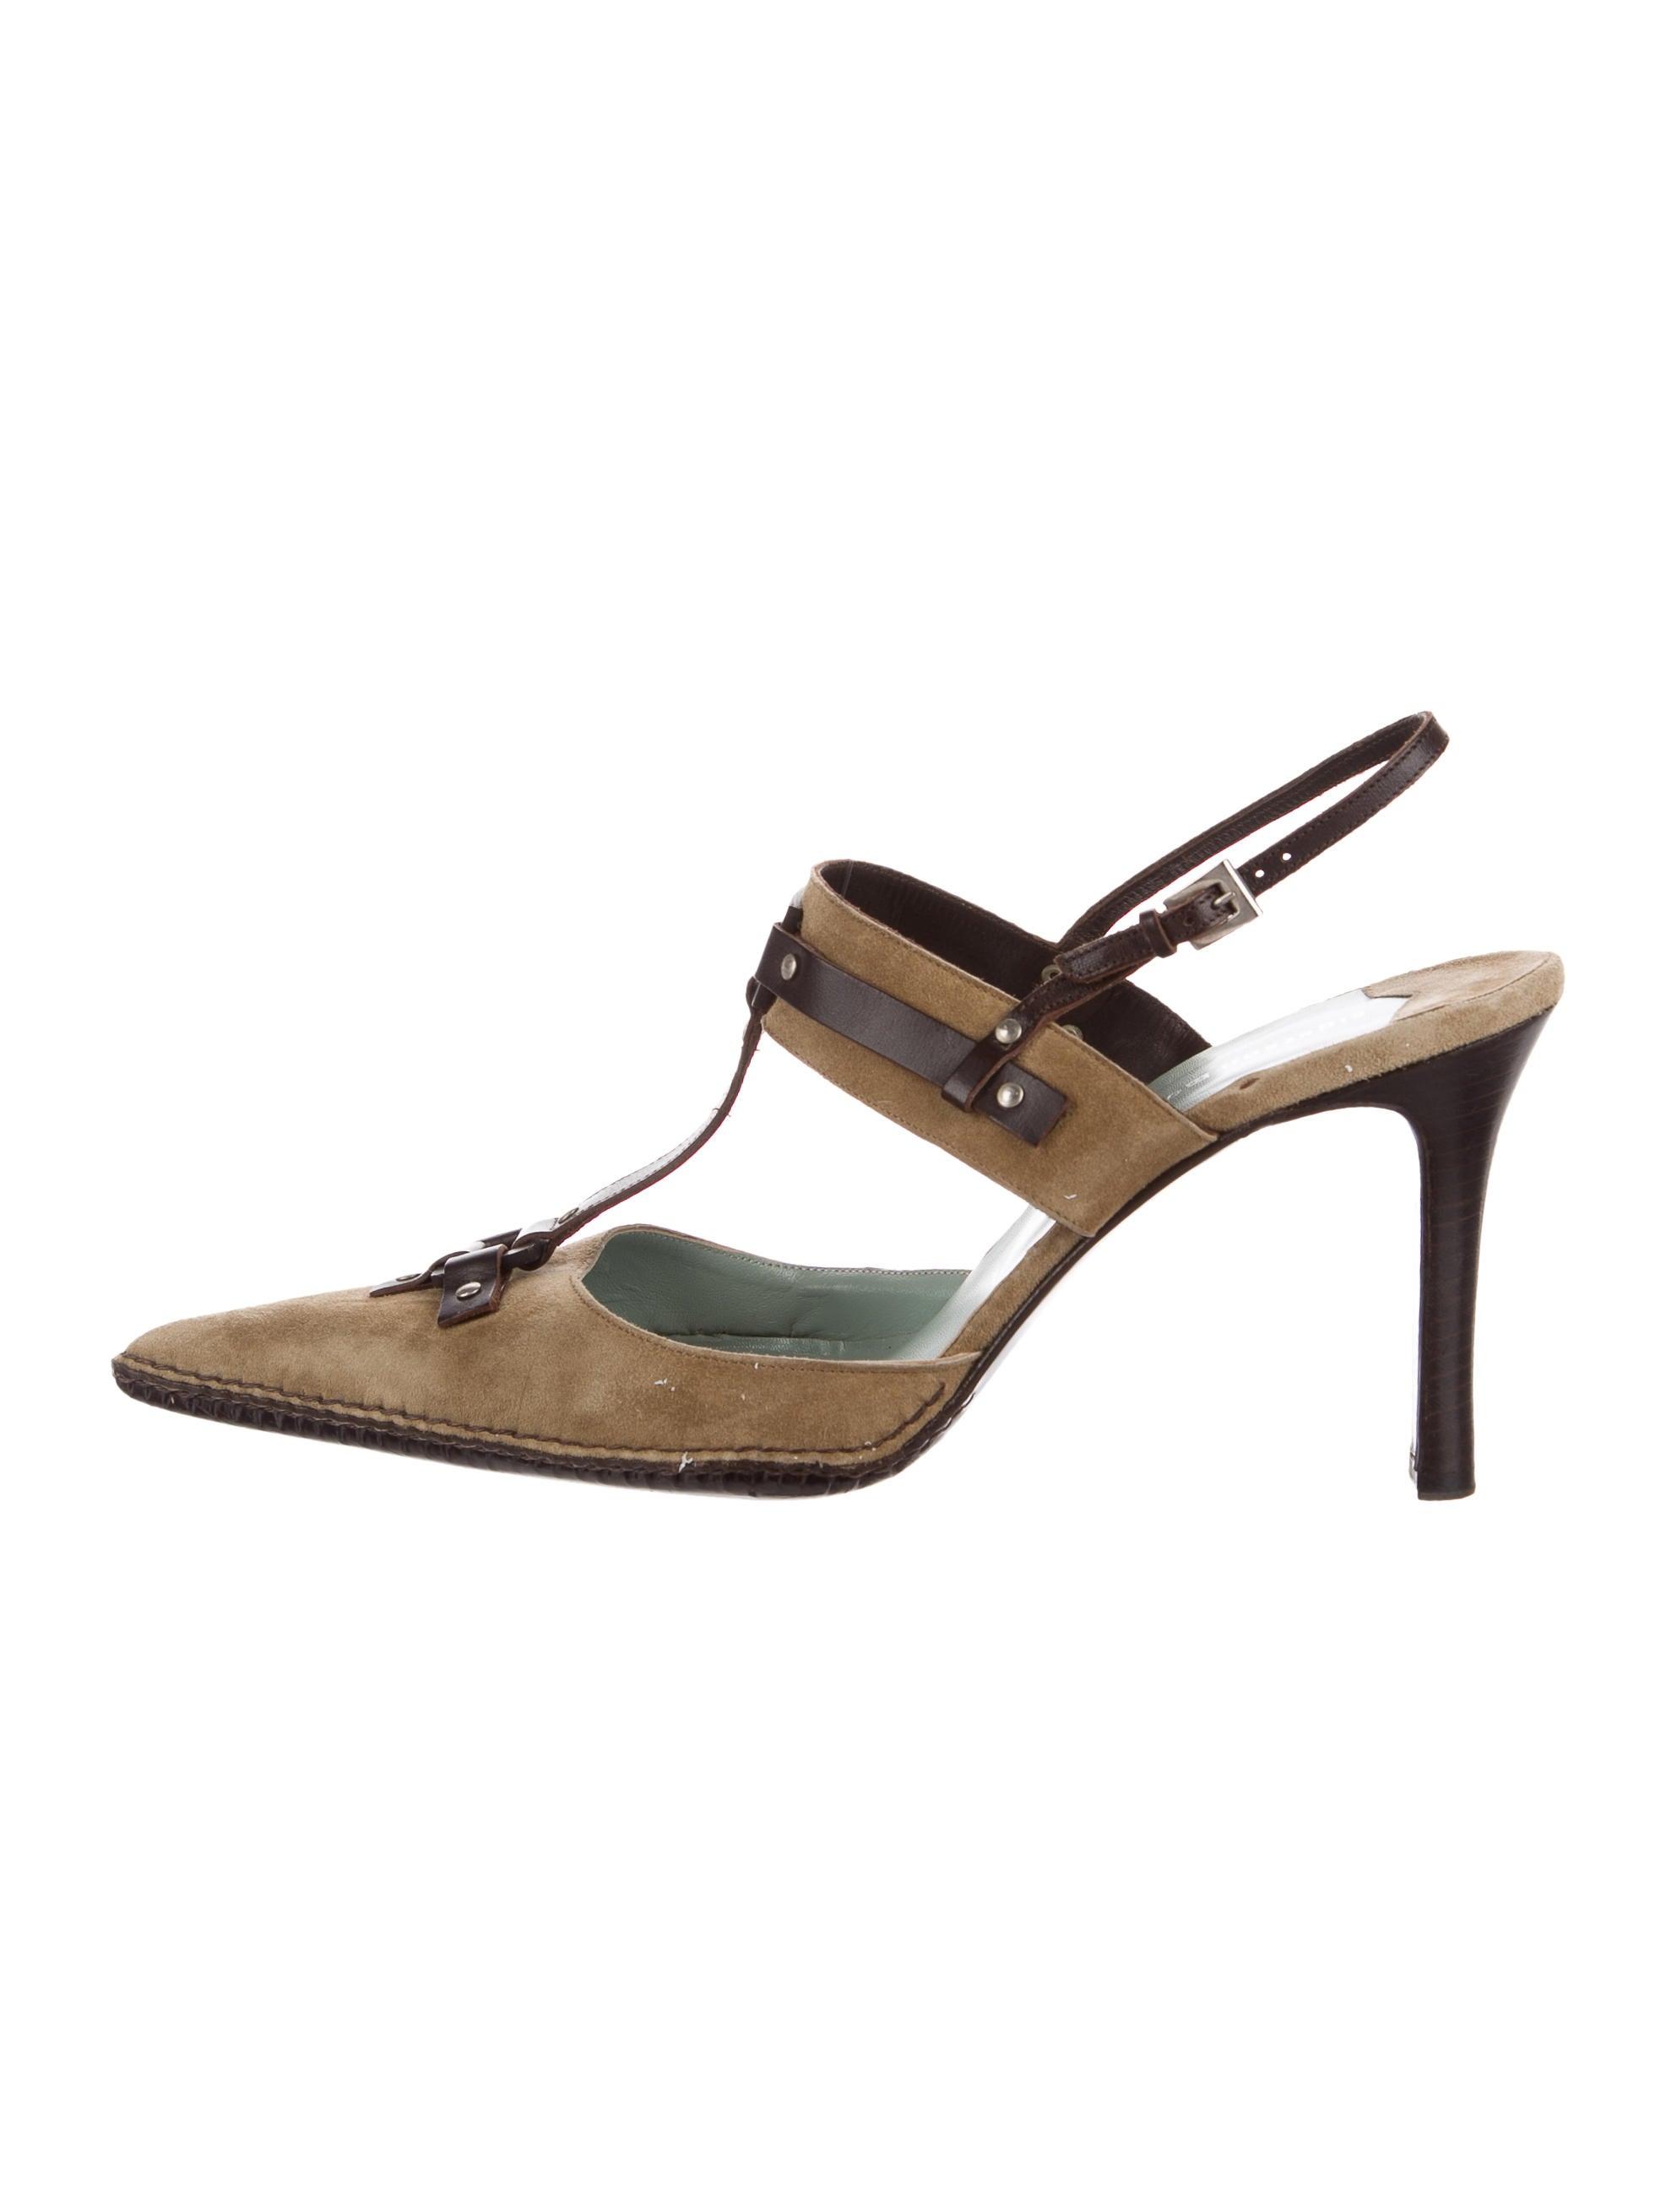 sigerson morrison suede t strap pumps shoes wsg20692 the realreal. Black Bedroom Furniture Sets. Home Design Ideas